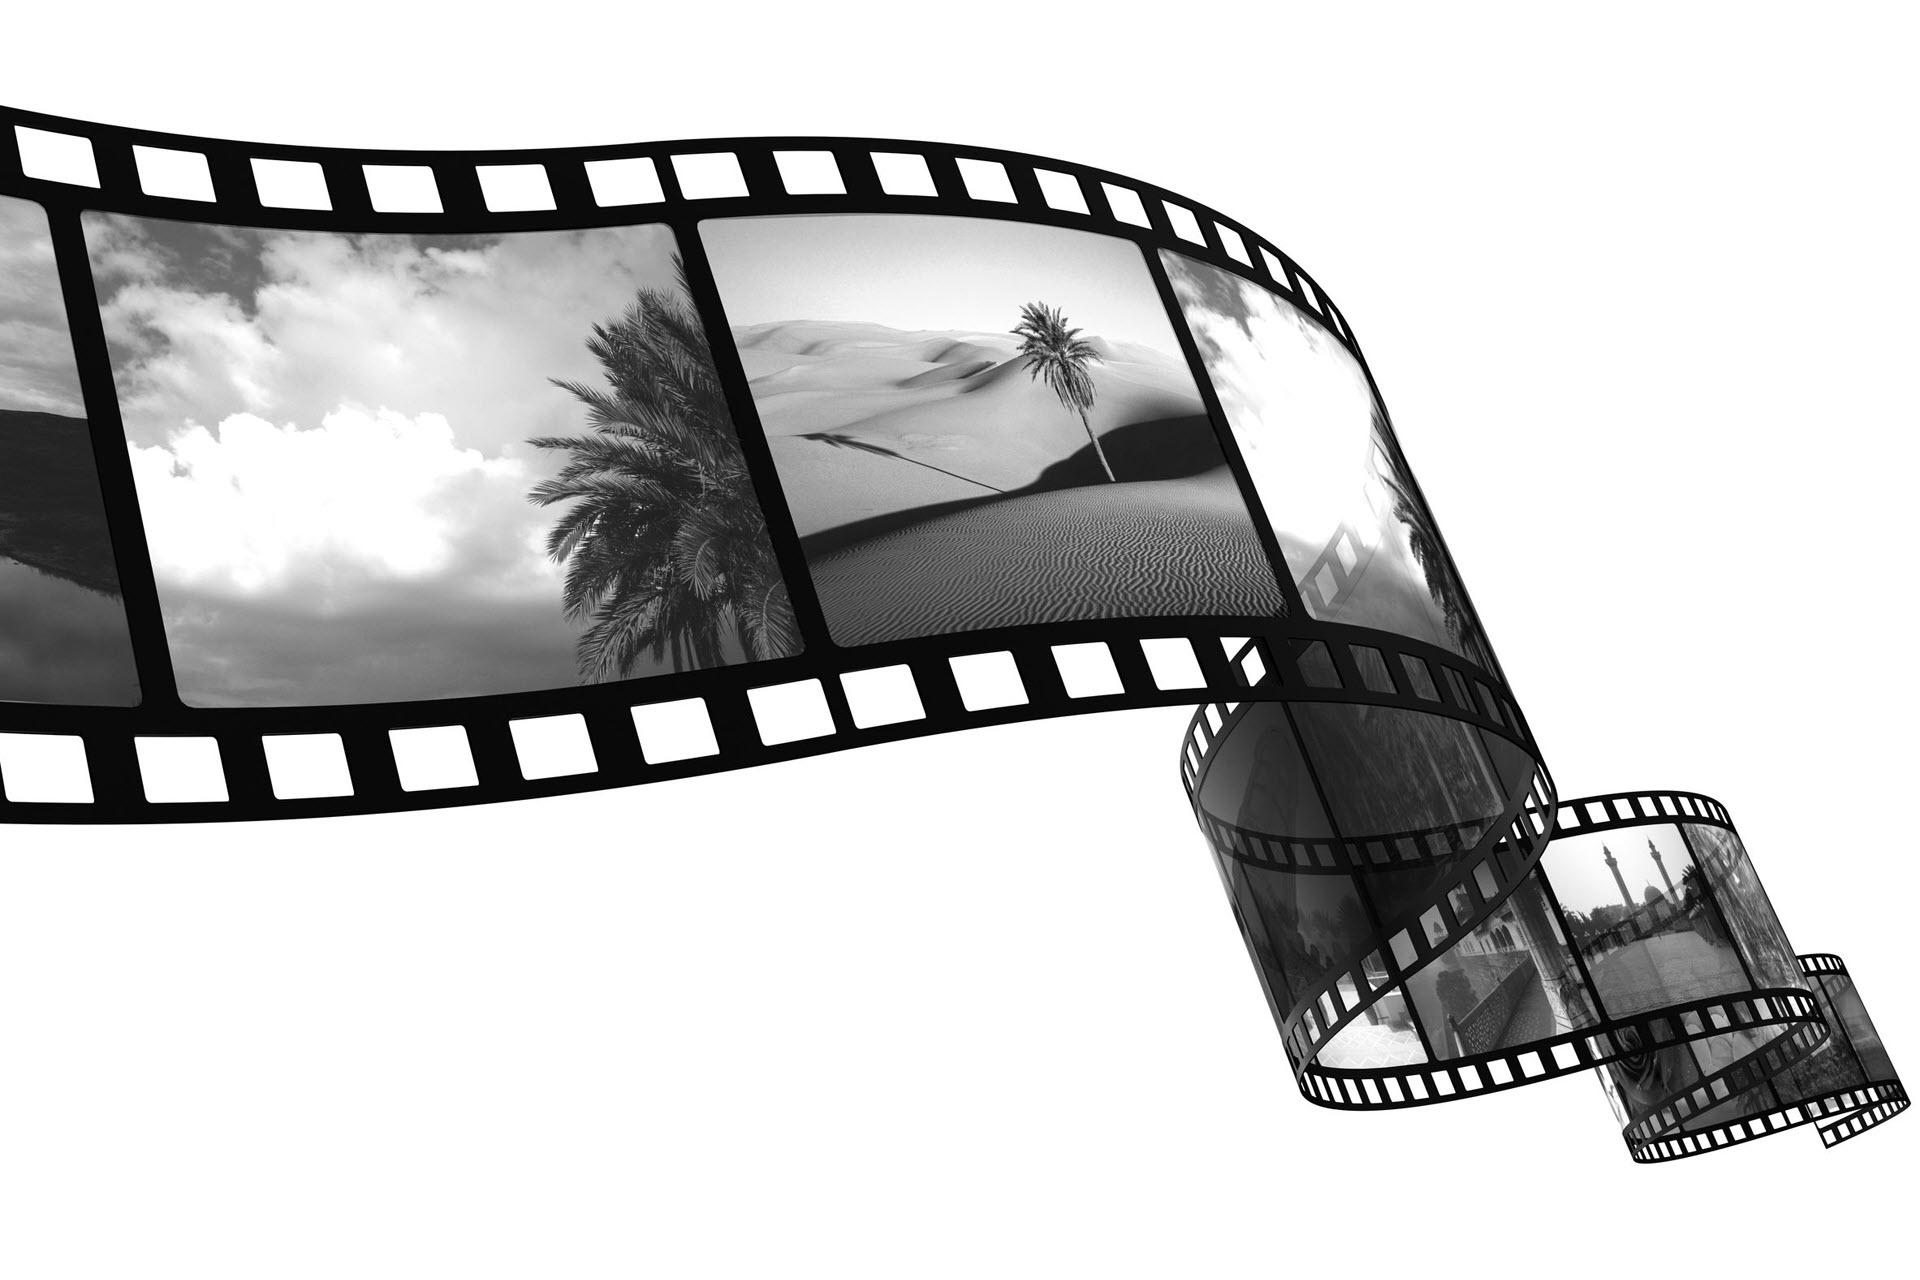 clipart pellicola cinematografica - photo #7